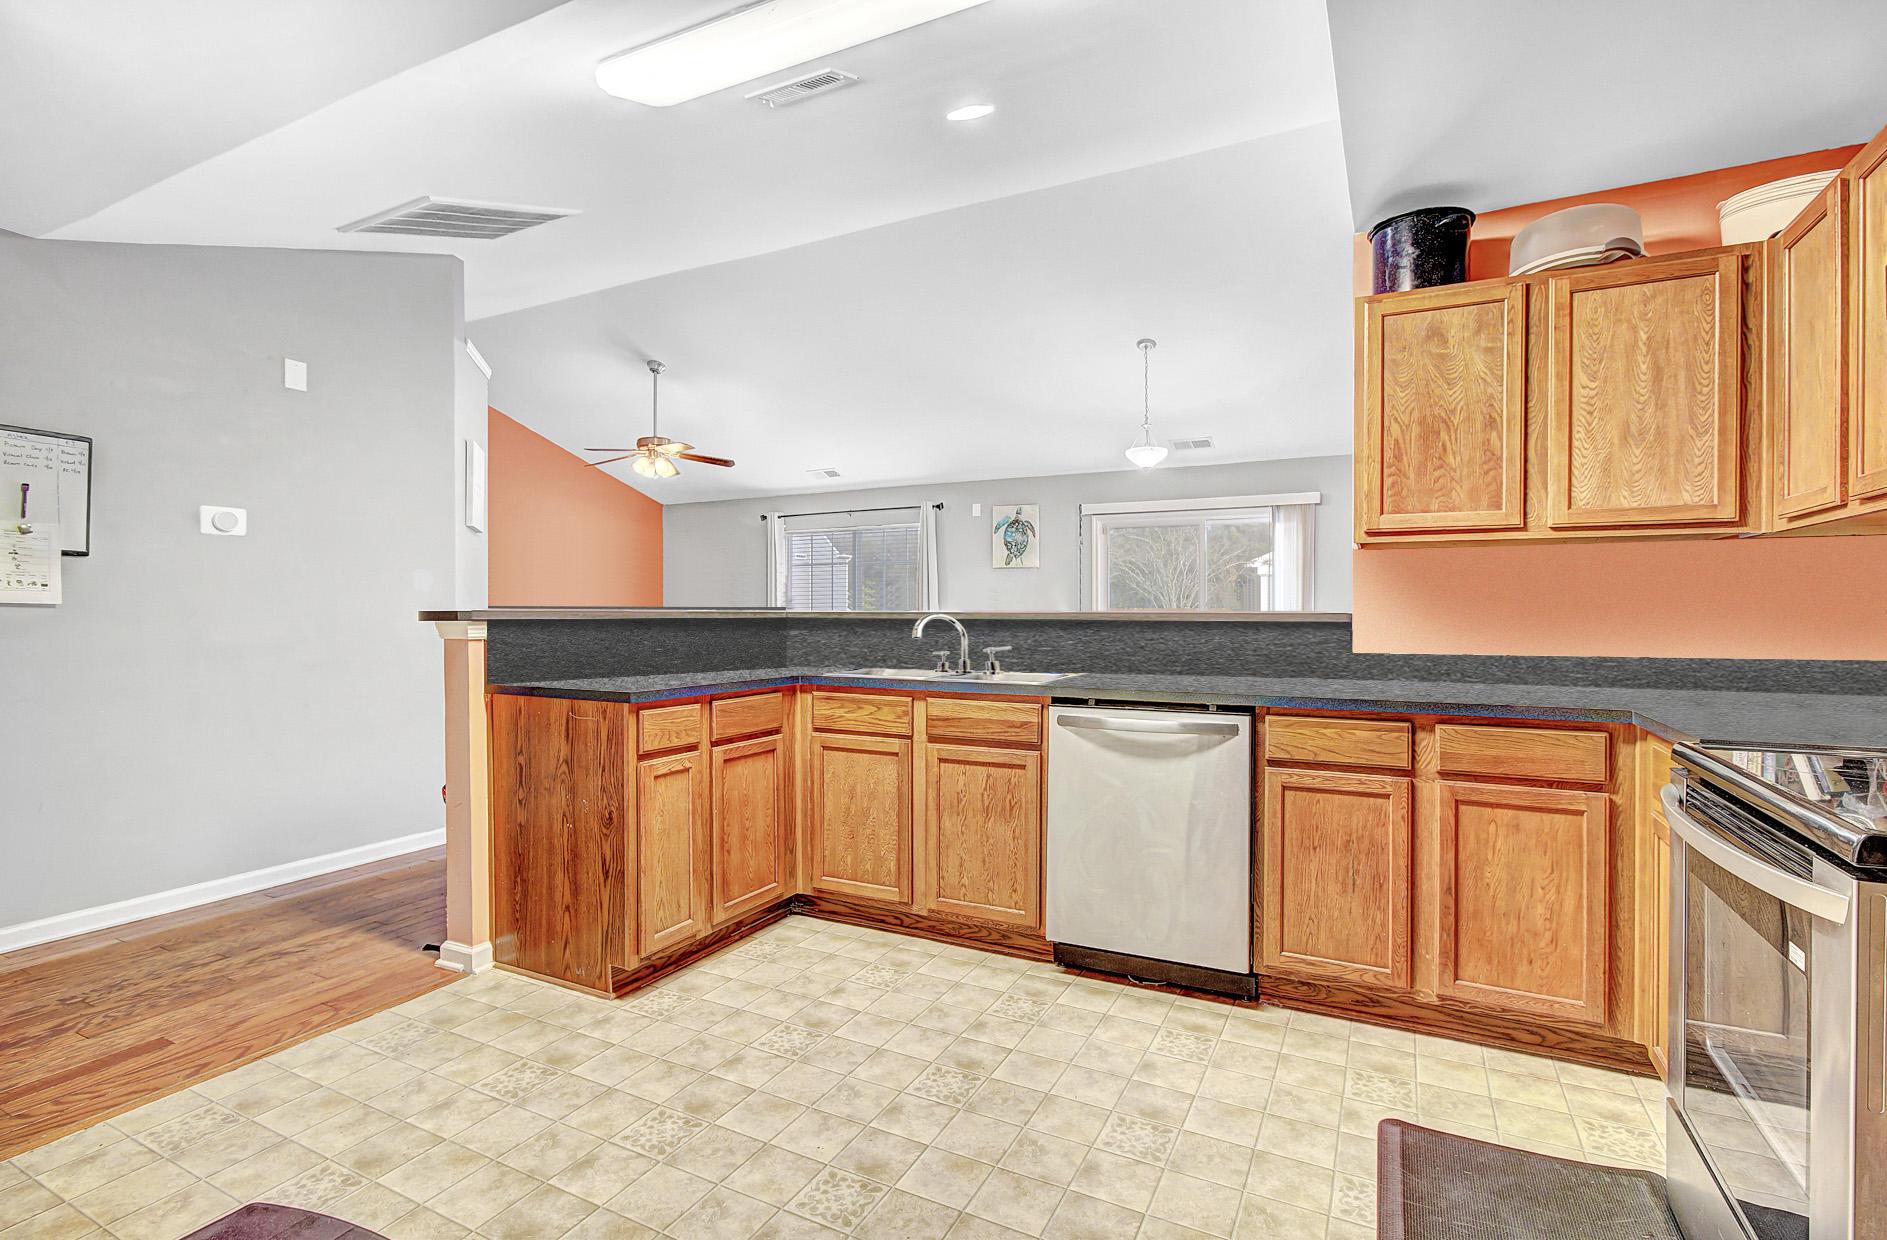 Oakley Pointe Homes For Sale - 231 Silk Oak, Moncks Corner, SC - 7